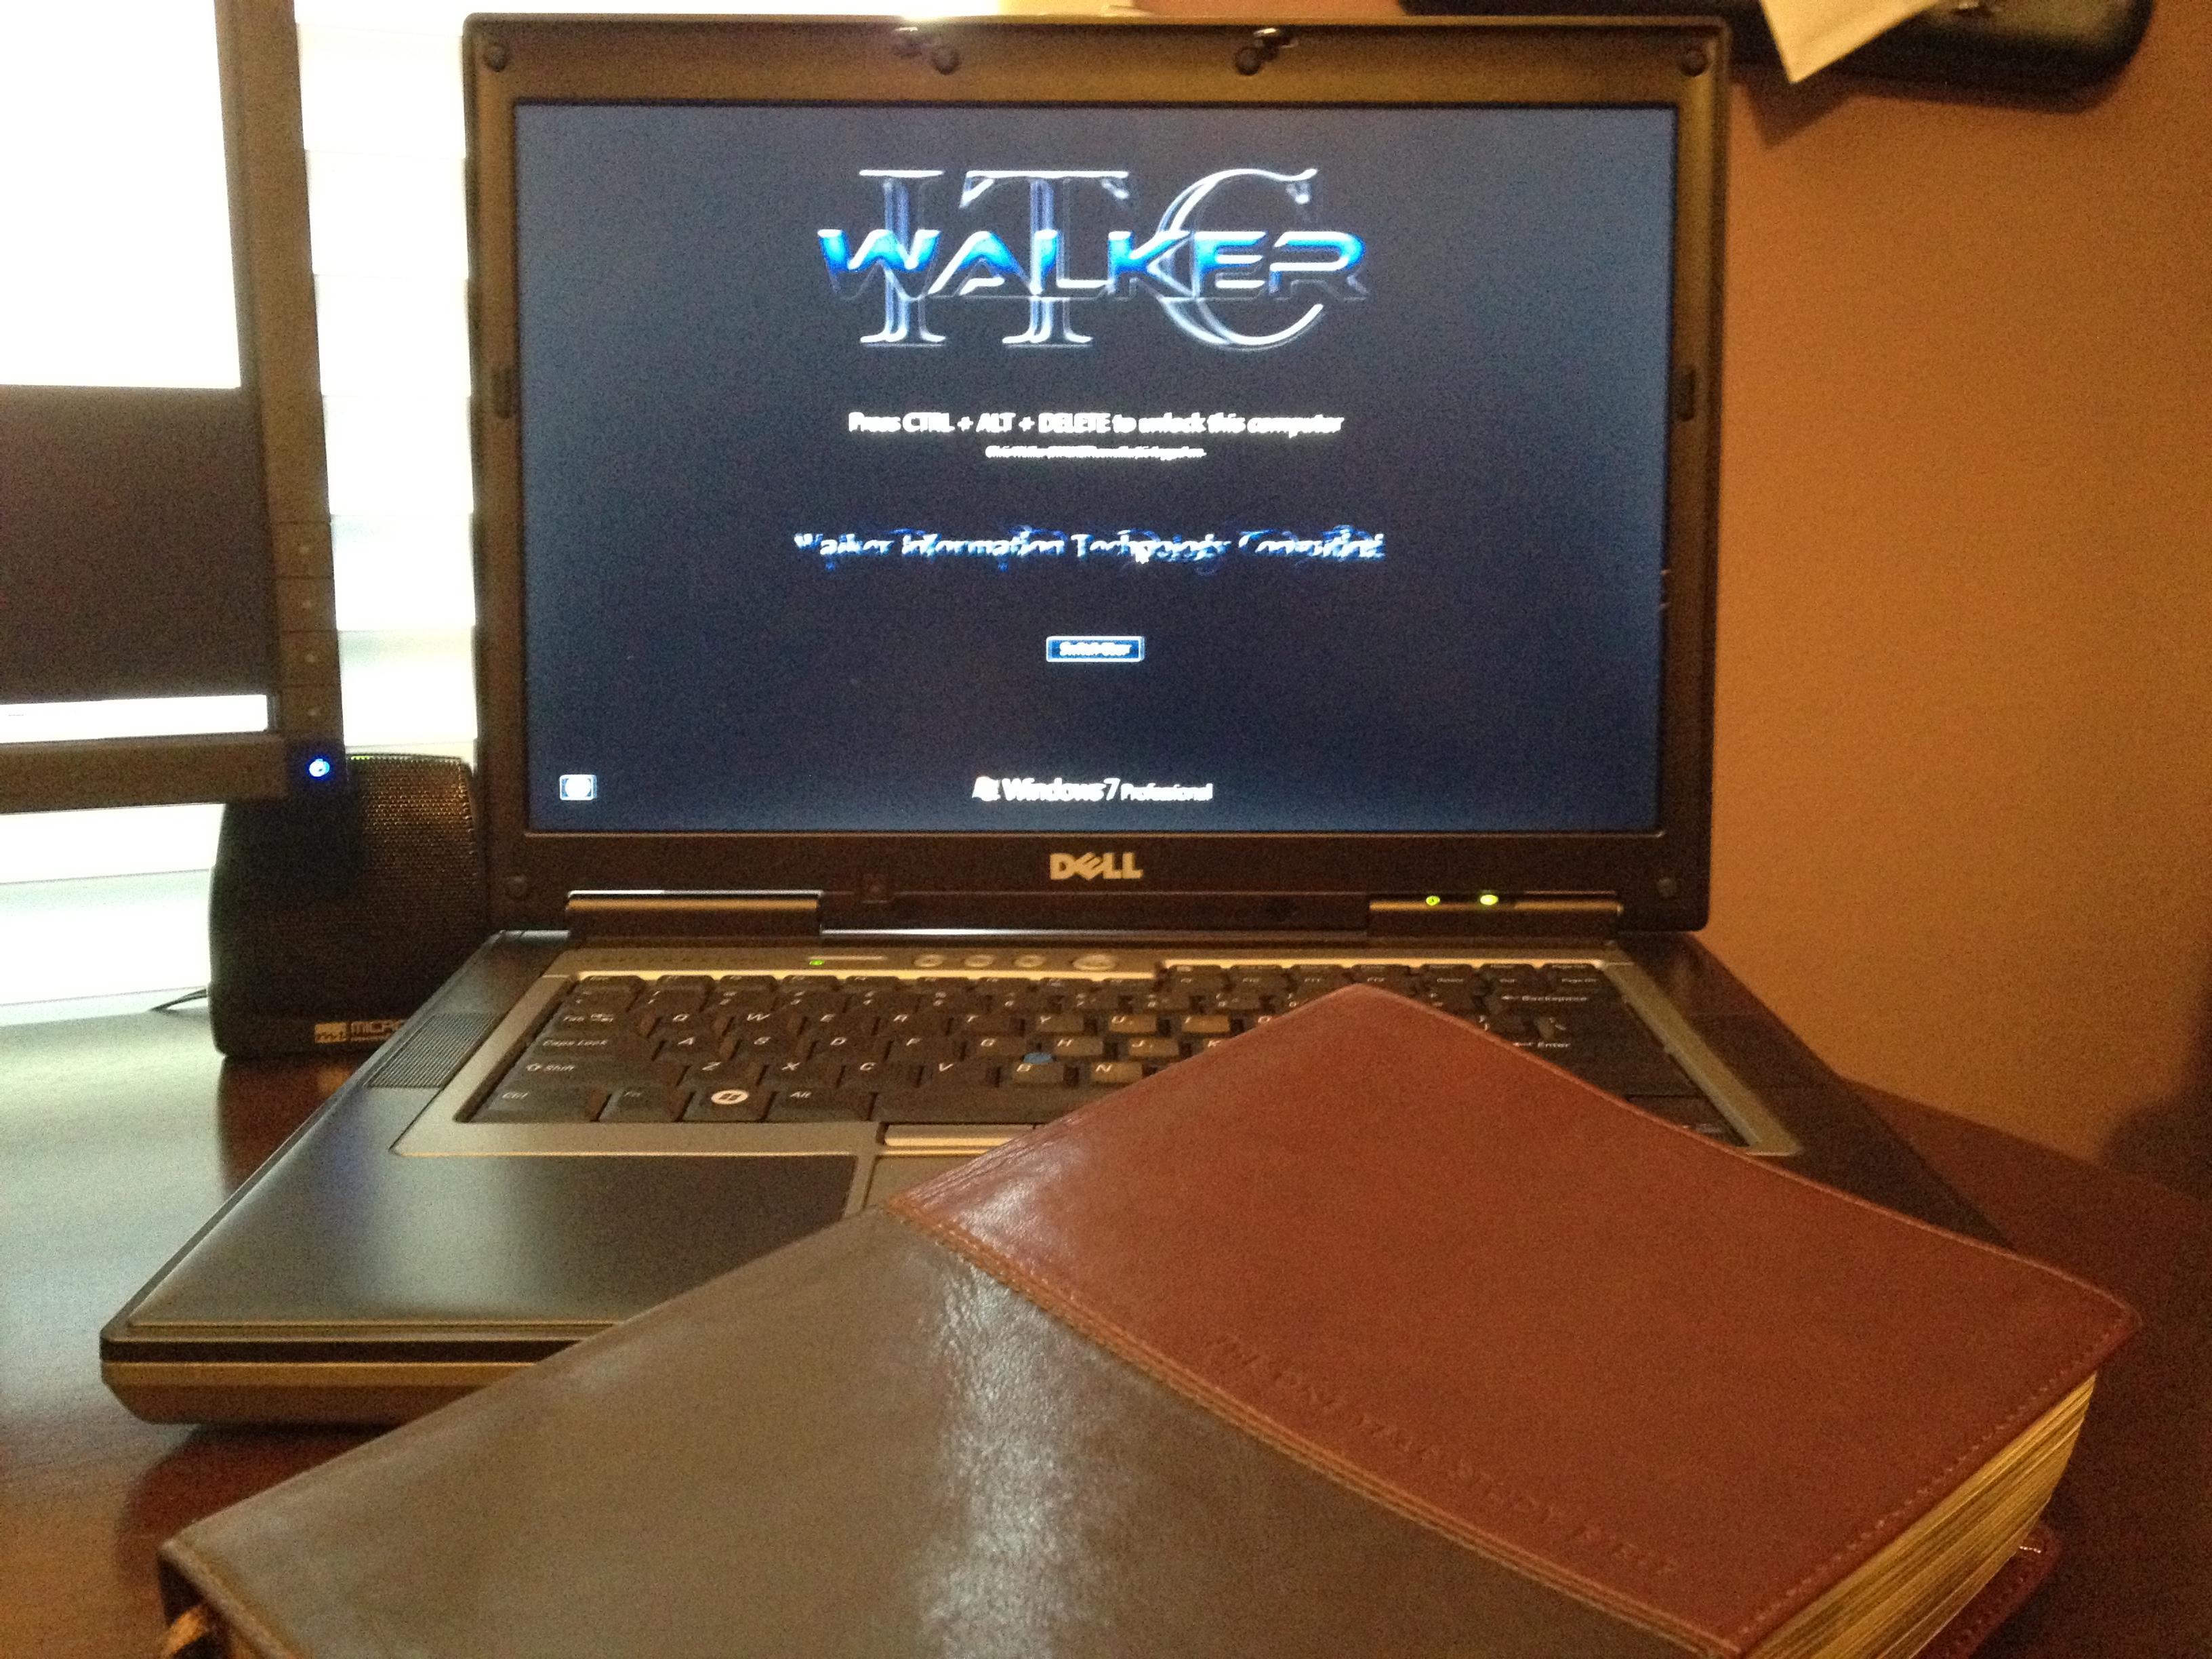 WalkerITC - Computer Repair - Network and IT Service - Texarkana image 0